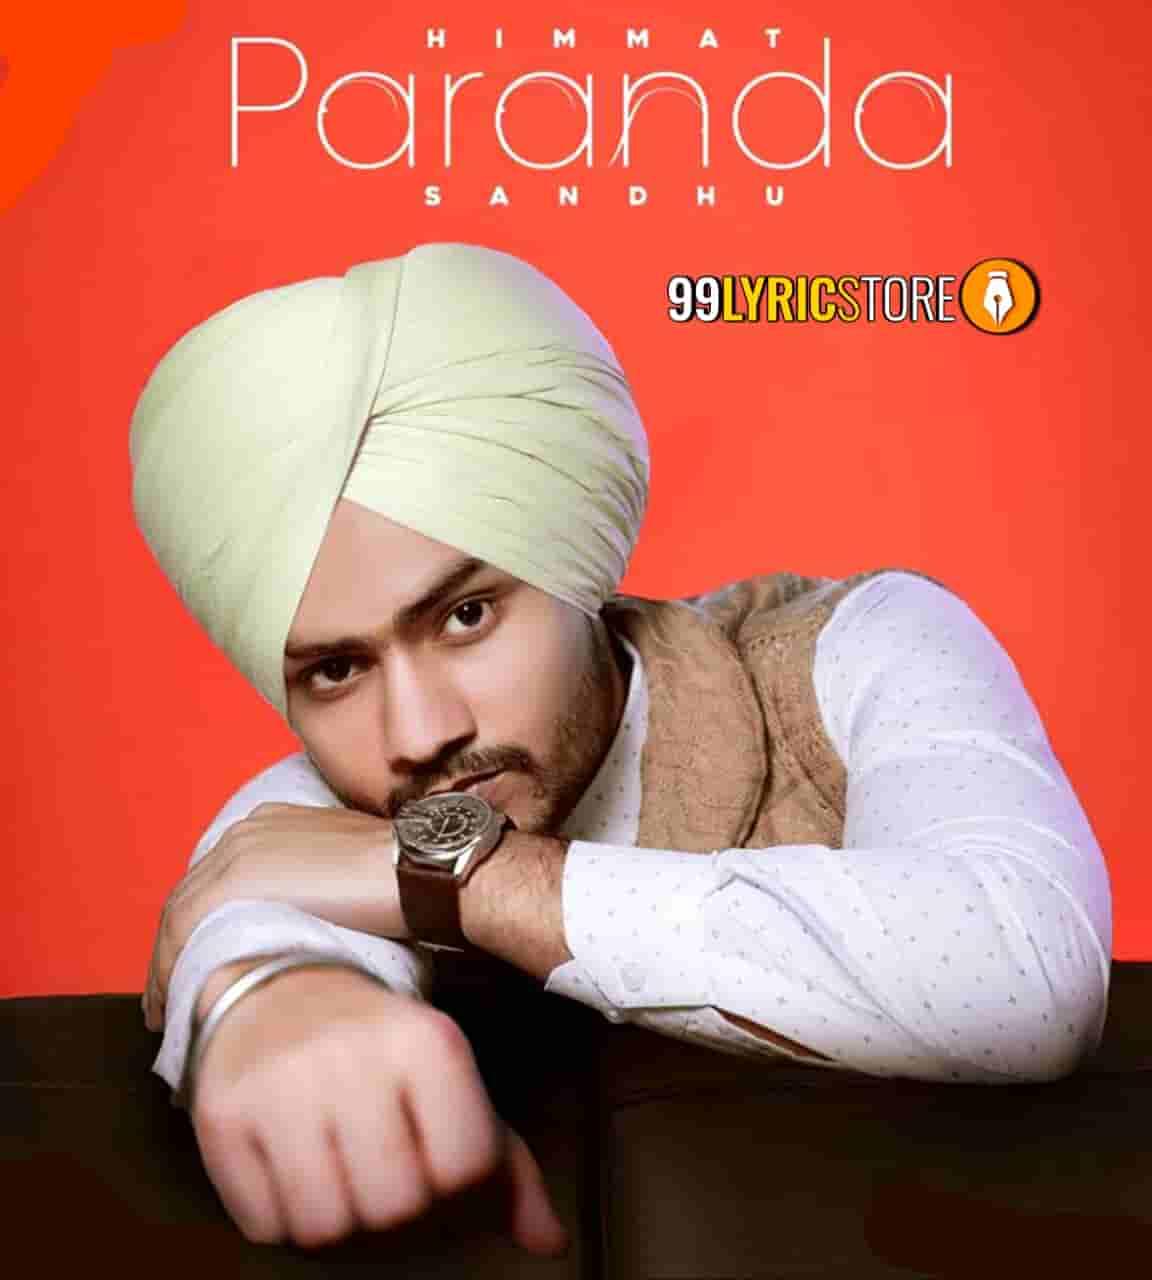 Paranda Punjabi Song Sung by Himmat Sandhu